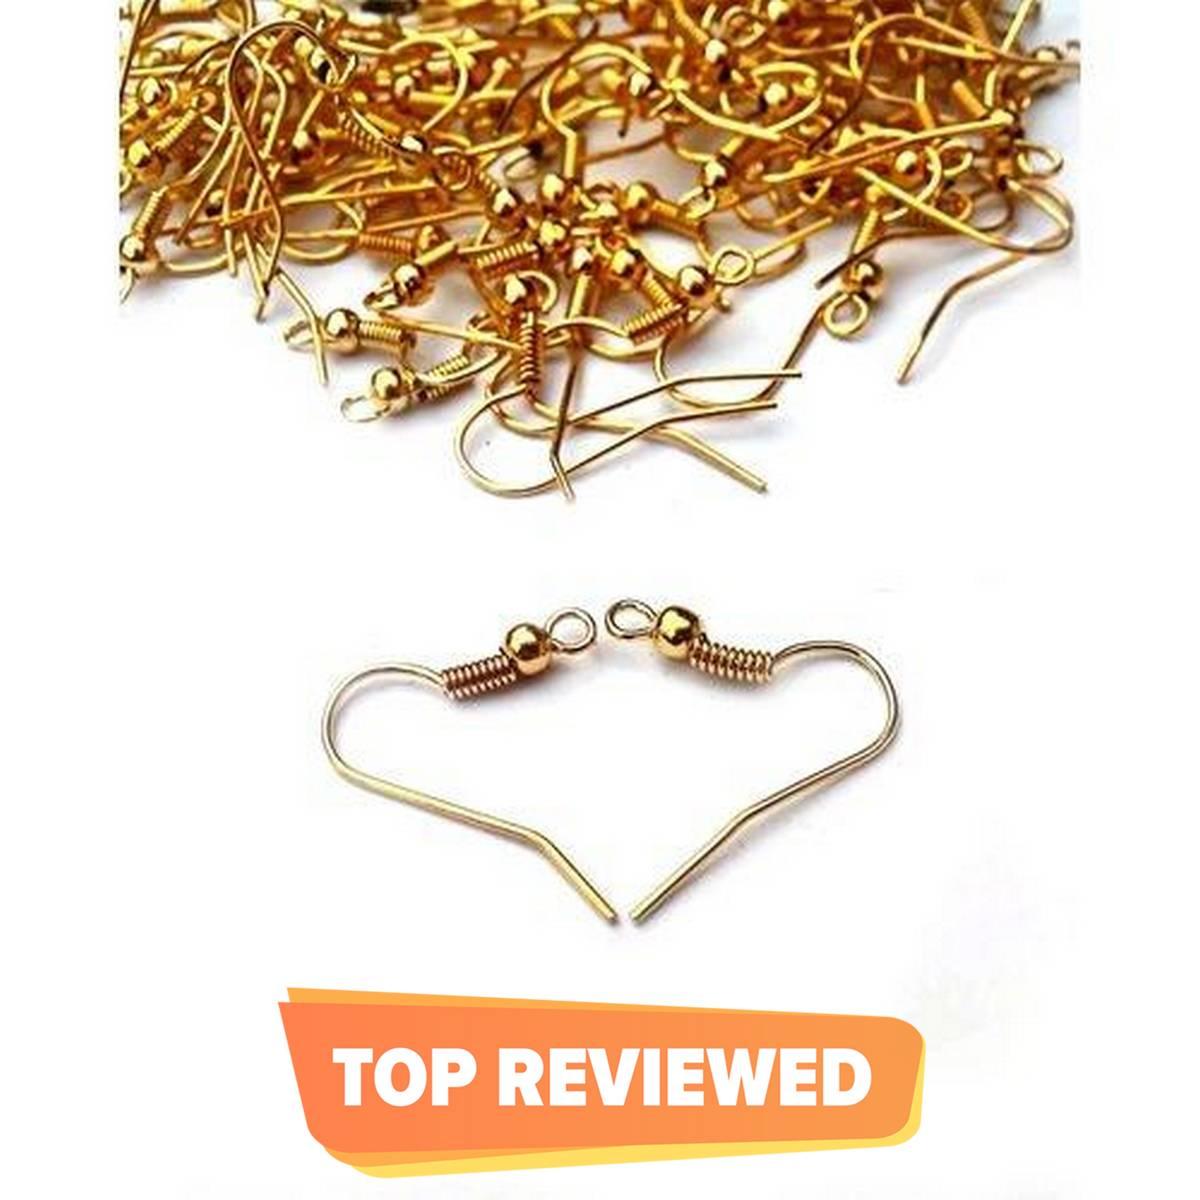 50 Pairs Golden Earring Hooks Base For Jewellery Making